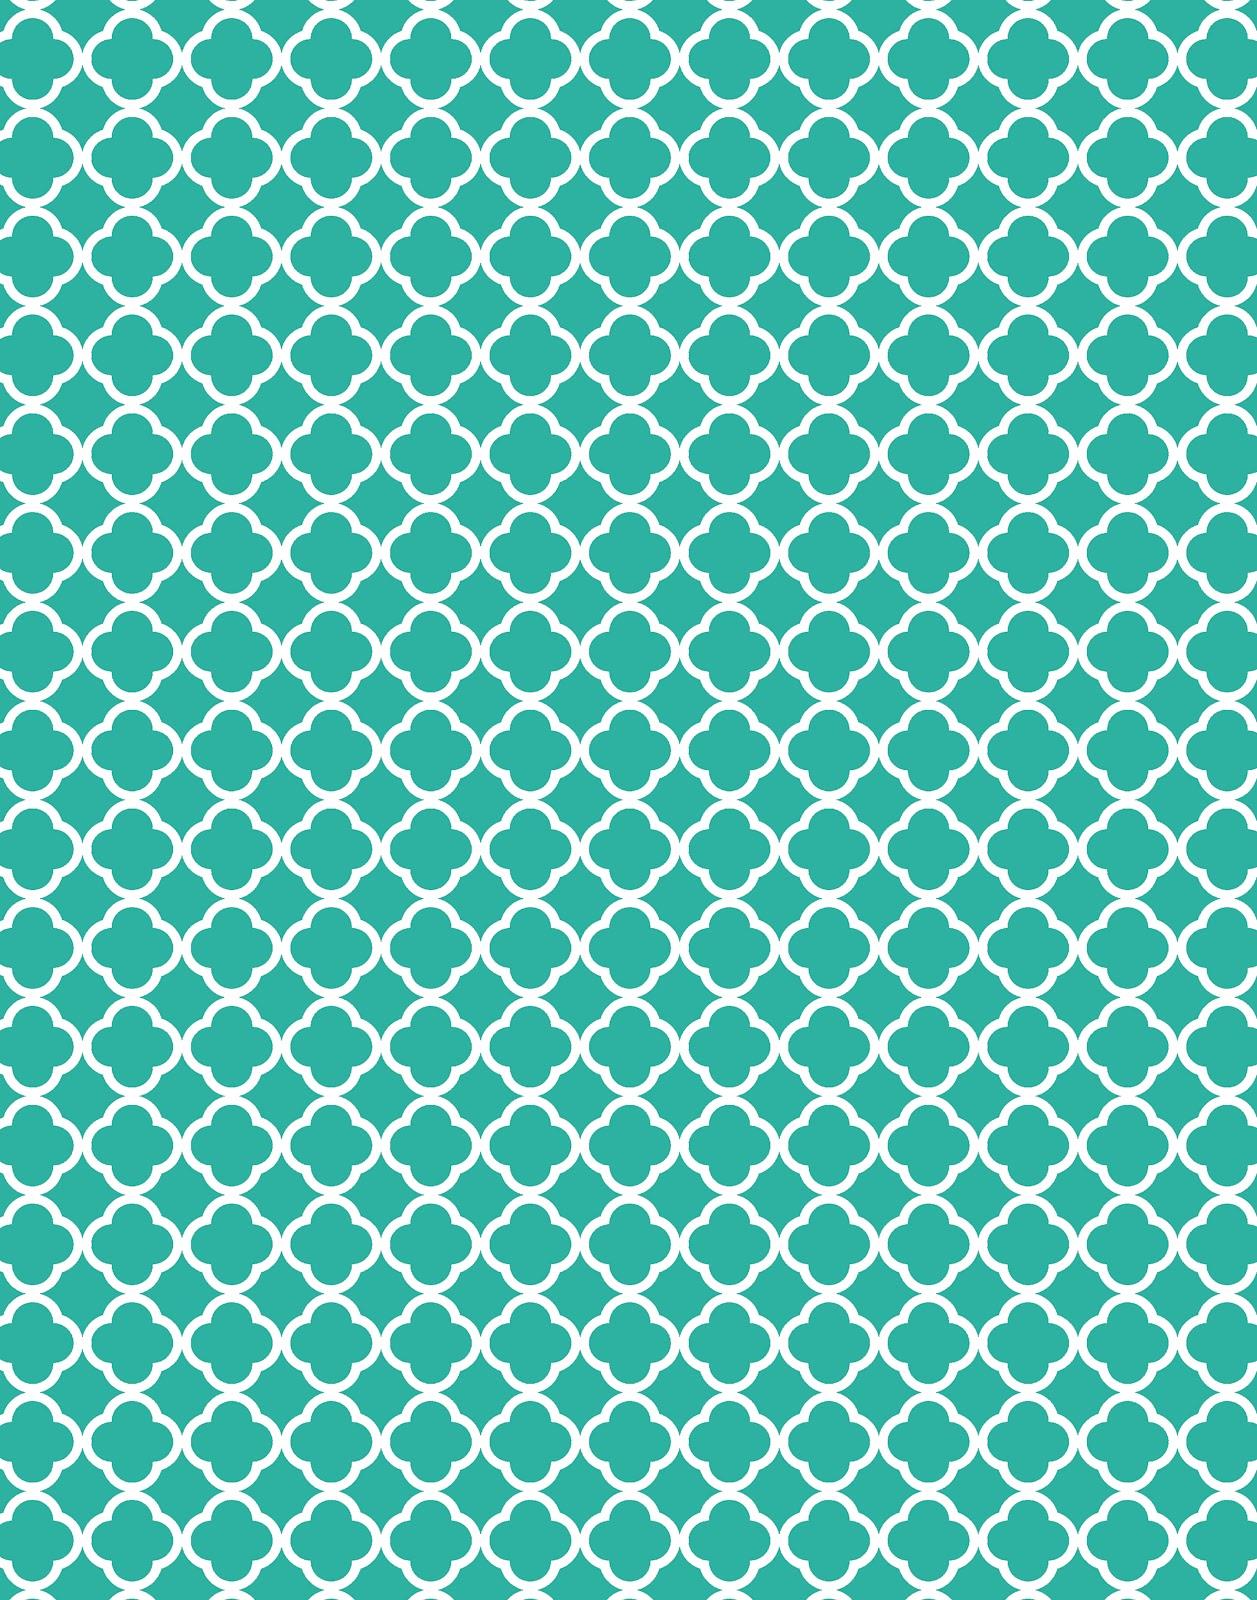 Doodlecraft Freebie digi Patterns backgrounds polka dots moroccan 1257x1600